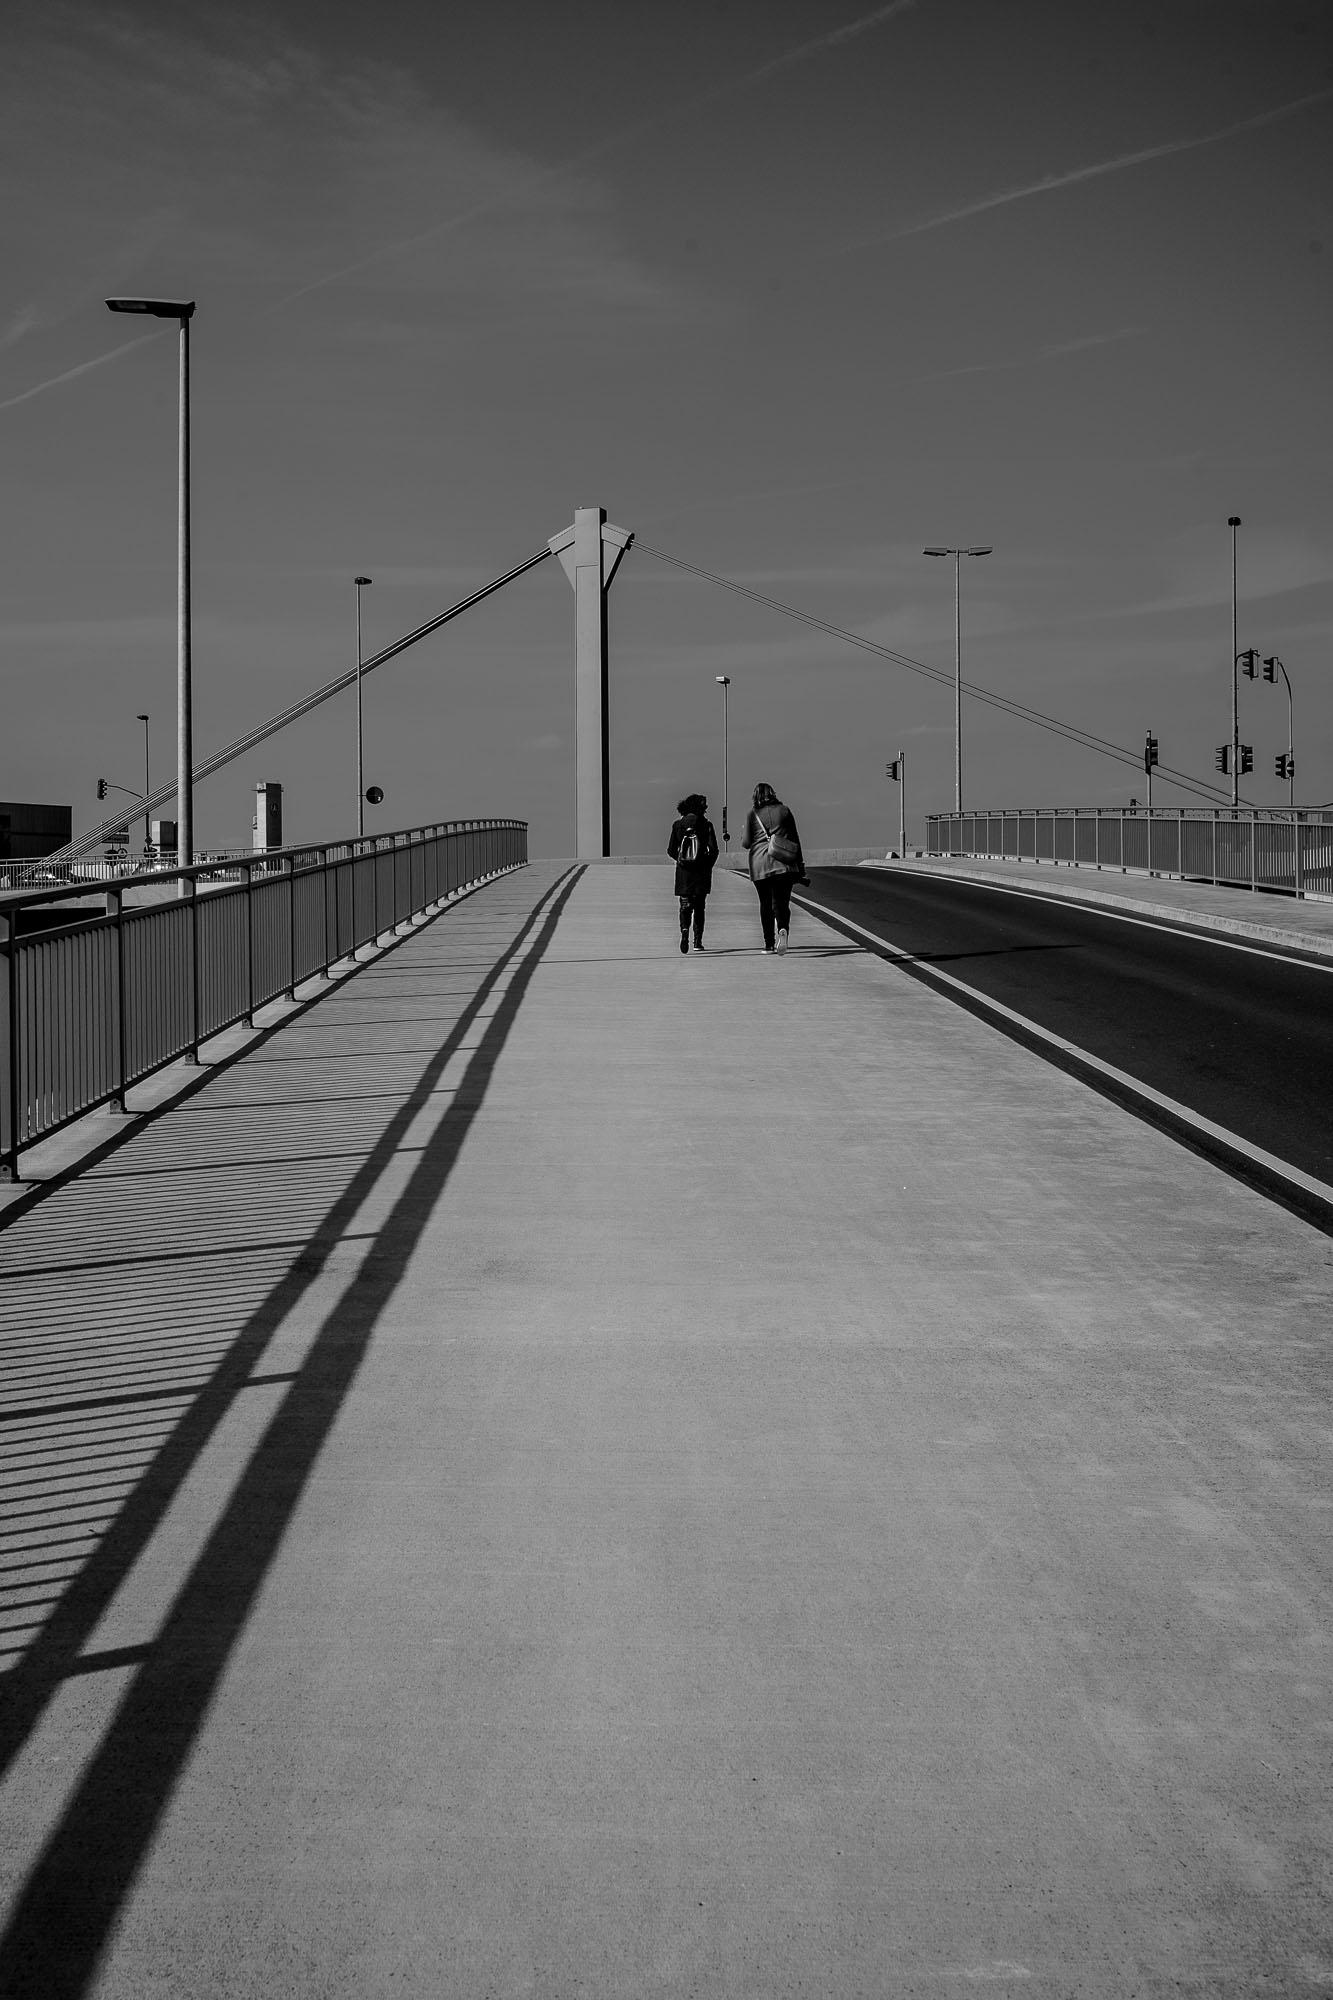 Two people walking up a bridge